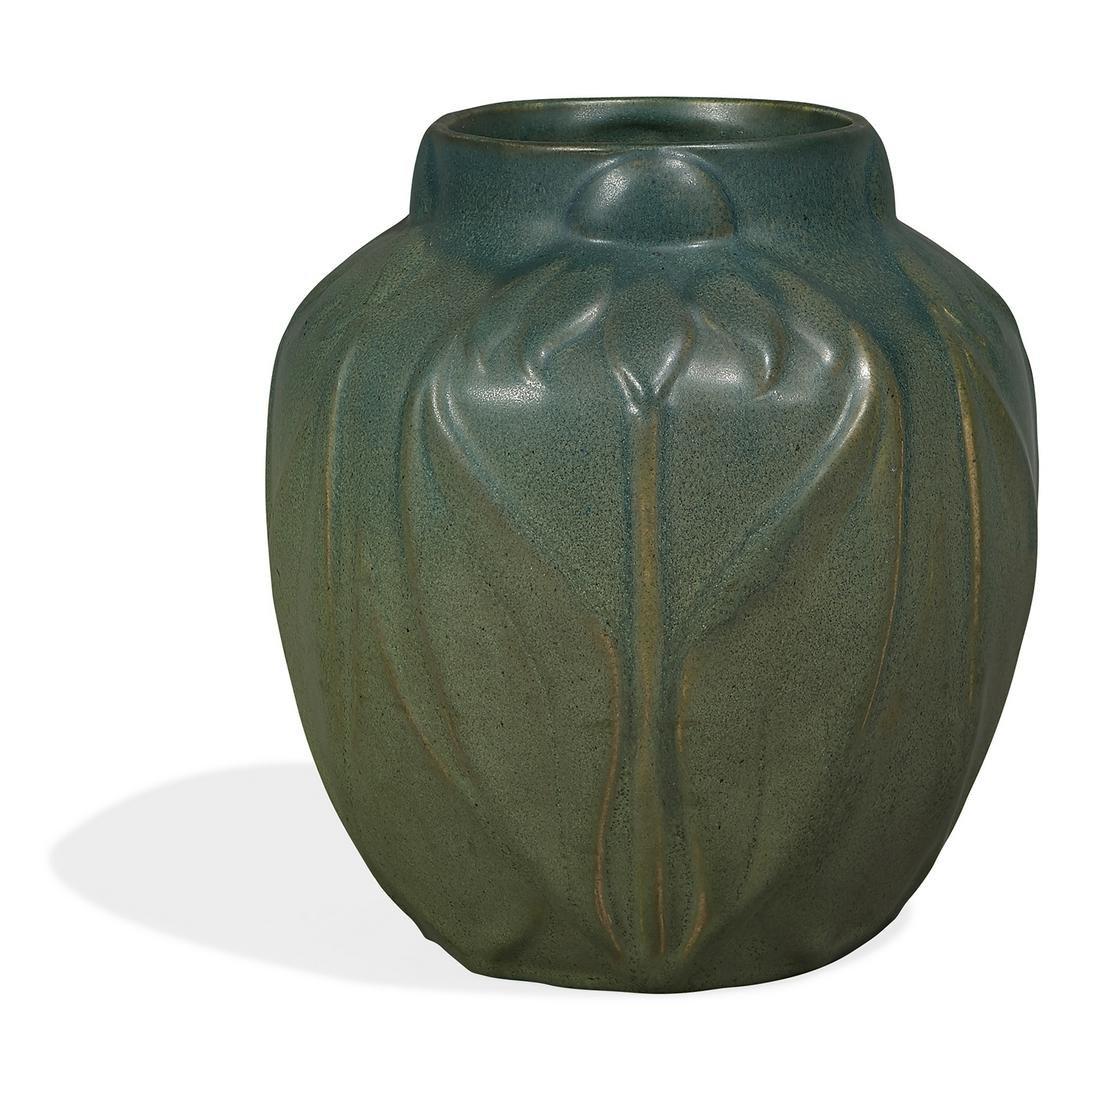 Van Briggle Pottery large vase with floral decoration